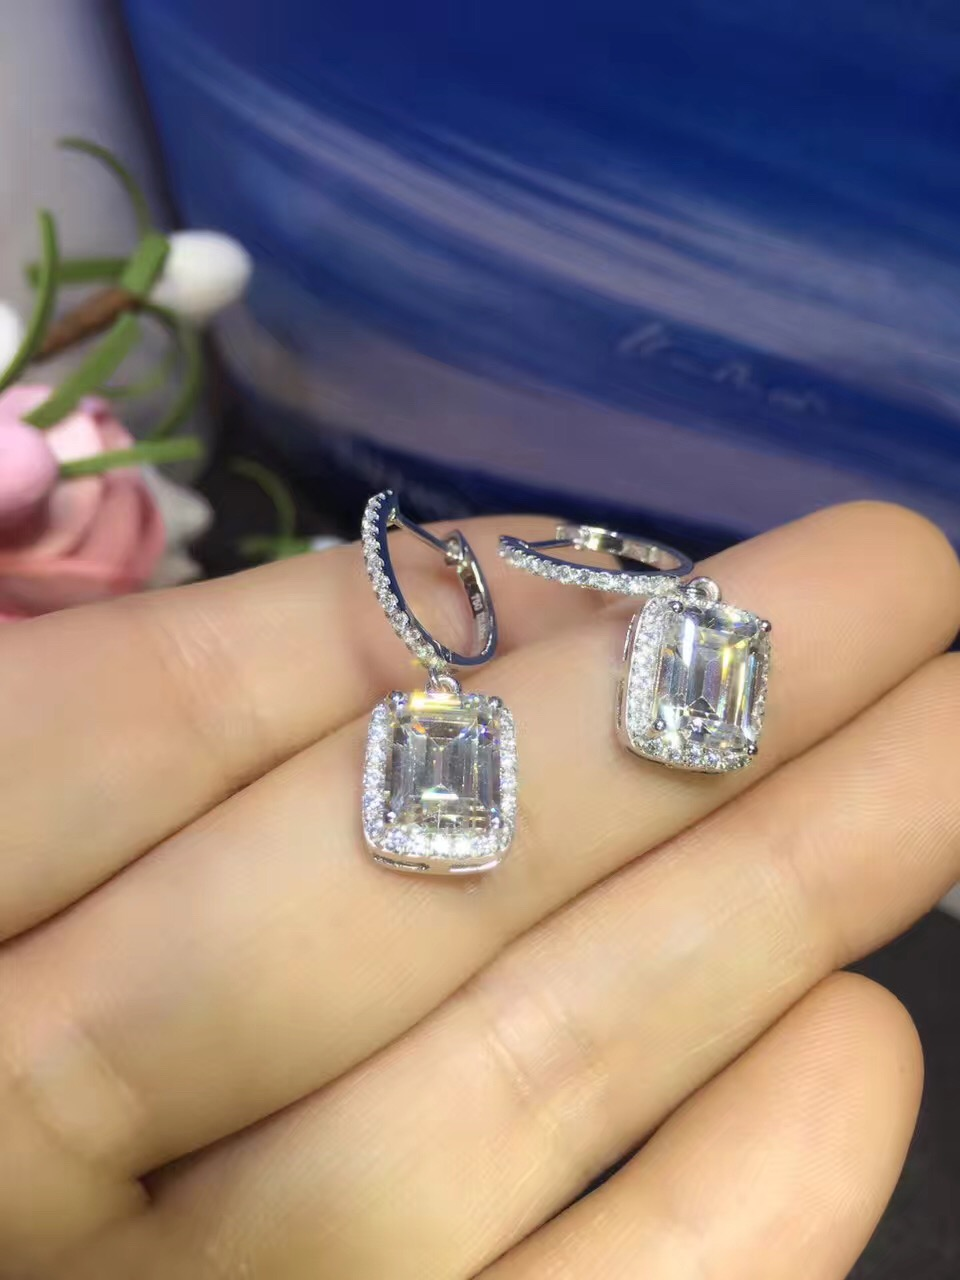 Luxury 2 Carats SONA Synthetic Gem Halo Studded Wedding Earrings, Promise Propose Earring,